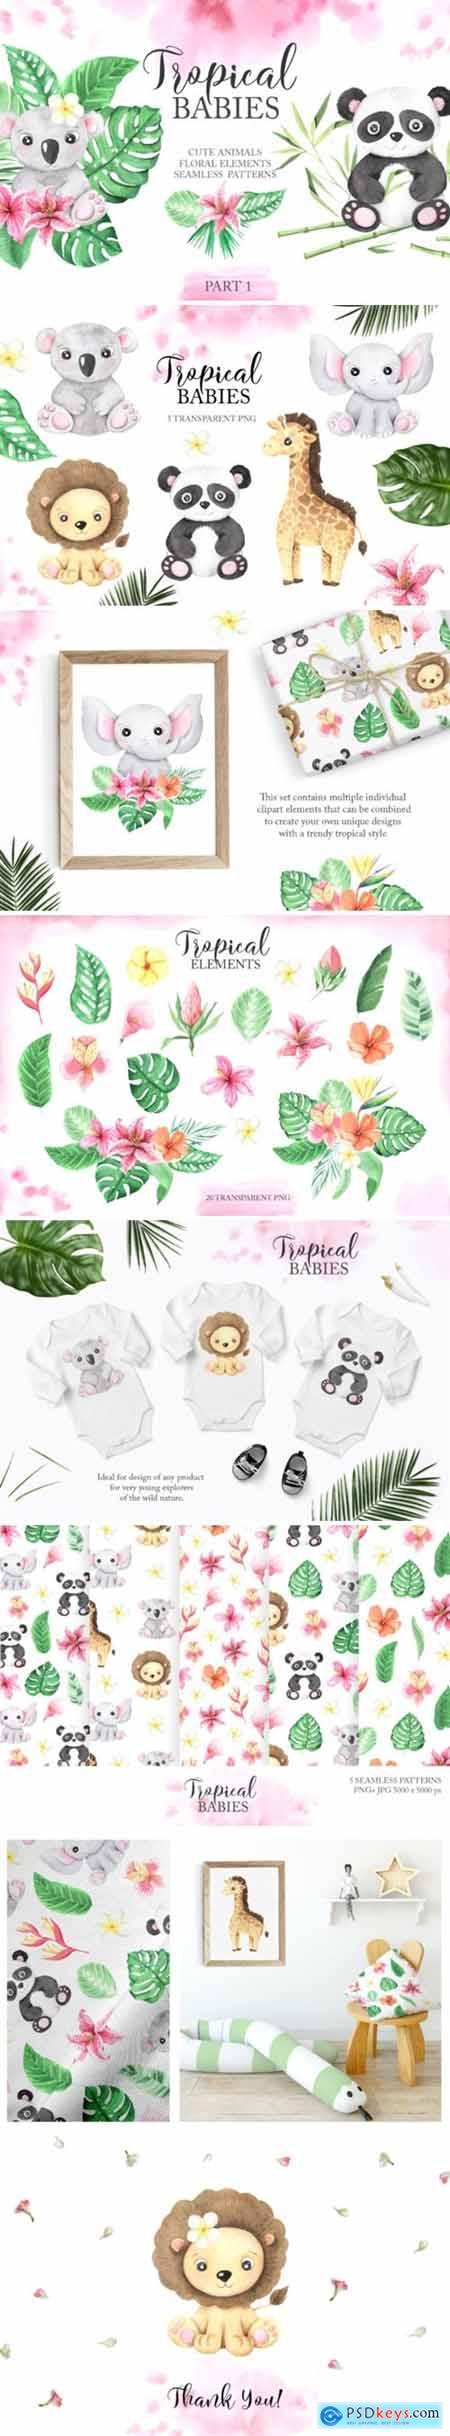 Watercolor Tropical Babies Set 1 3673167